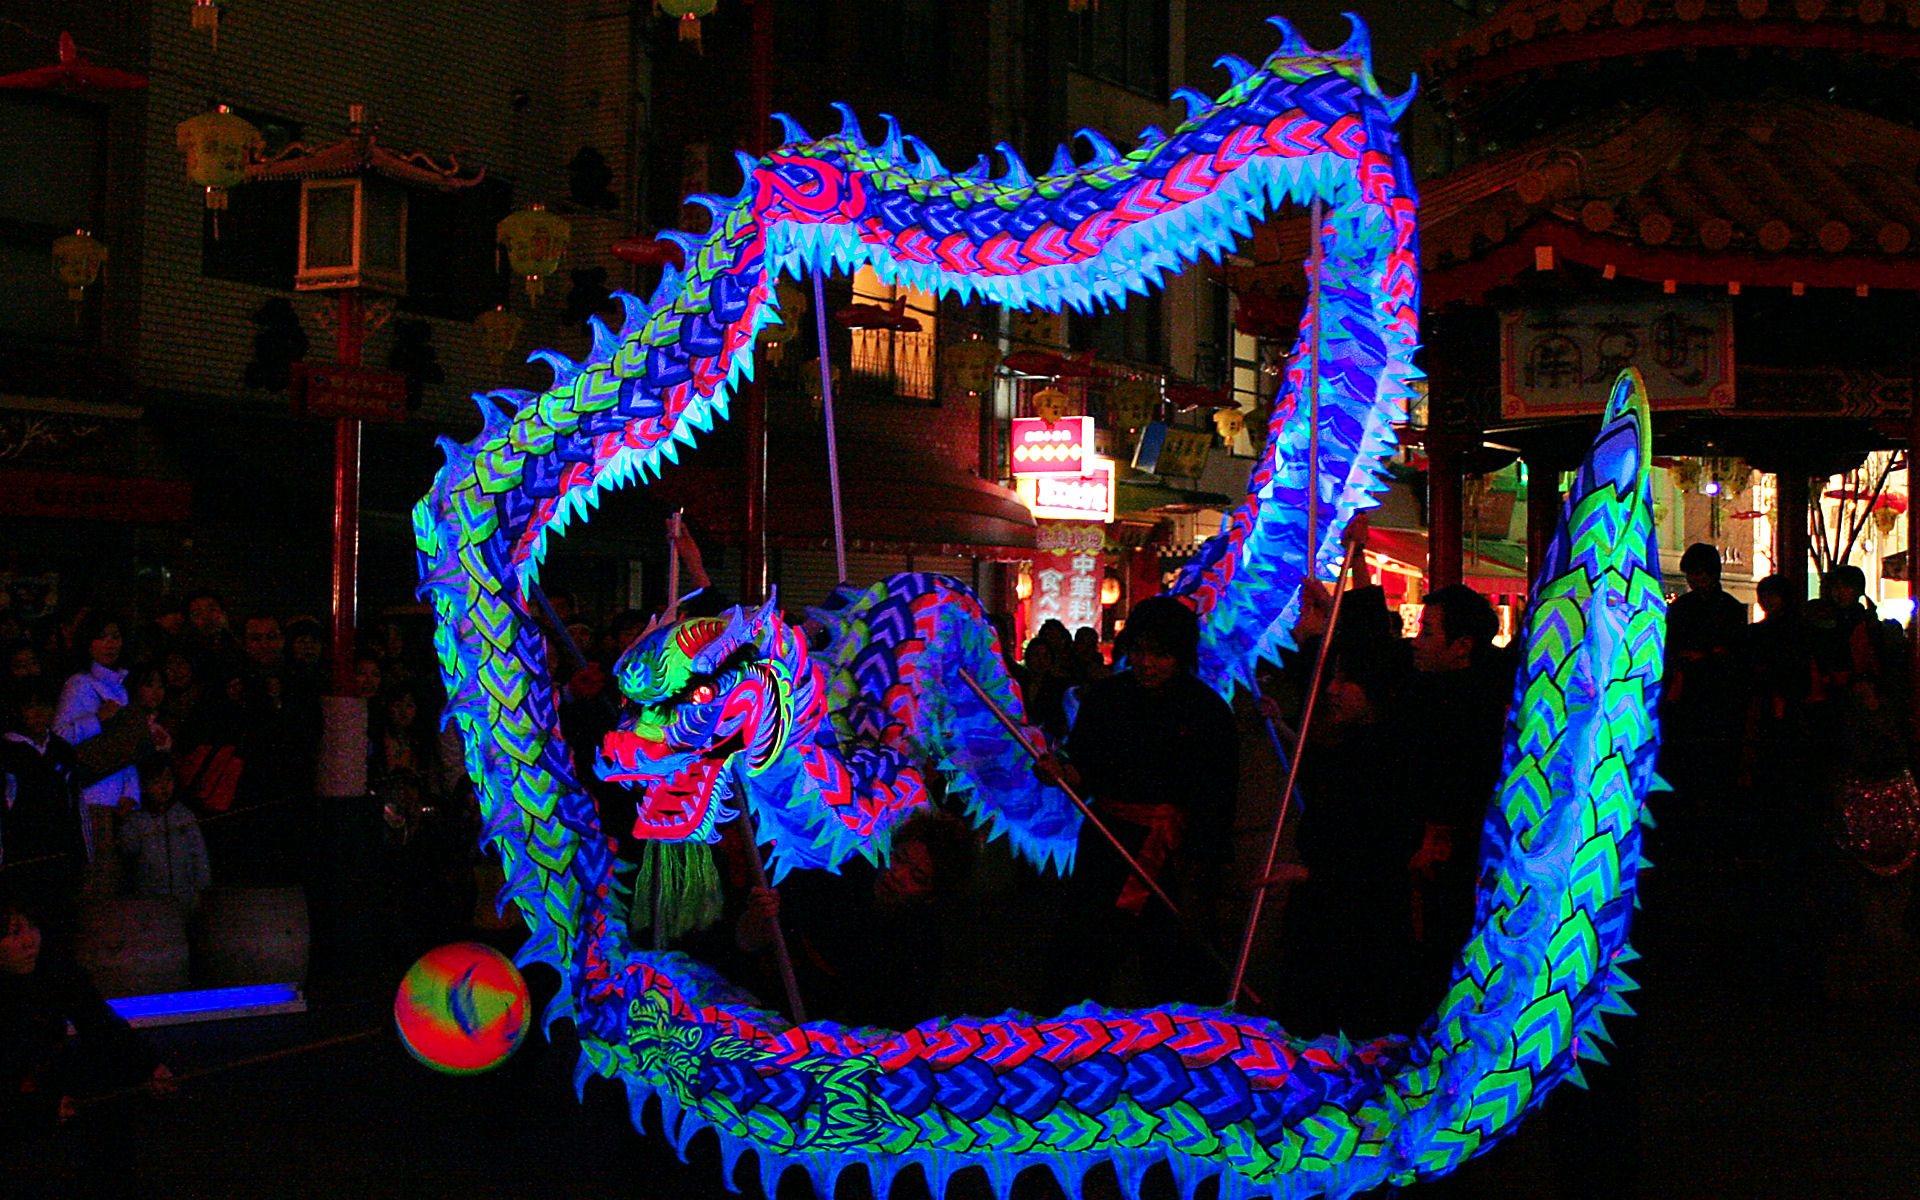 神戸南京町春節祭の夜光龍/WUXGA1920×1200